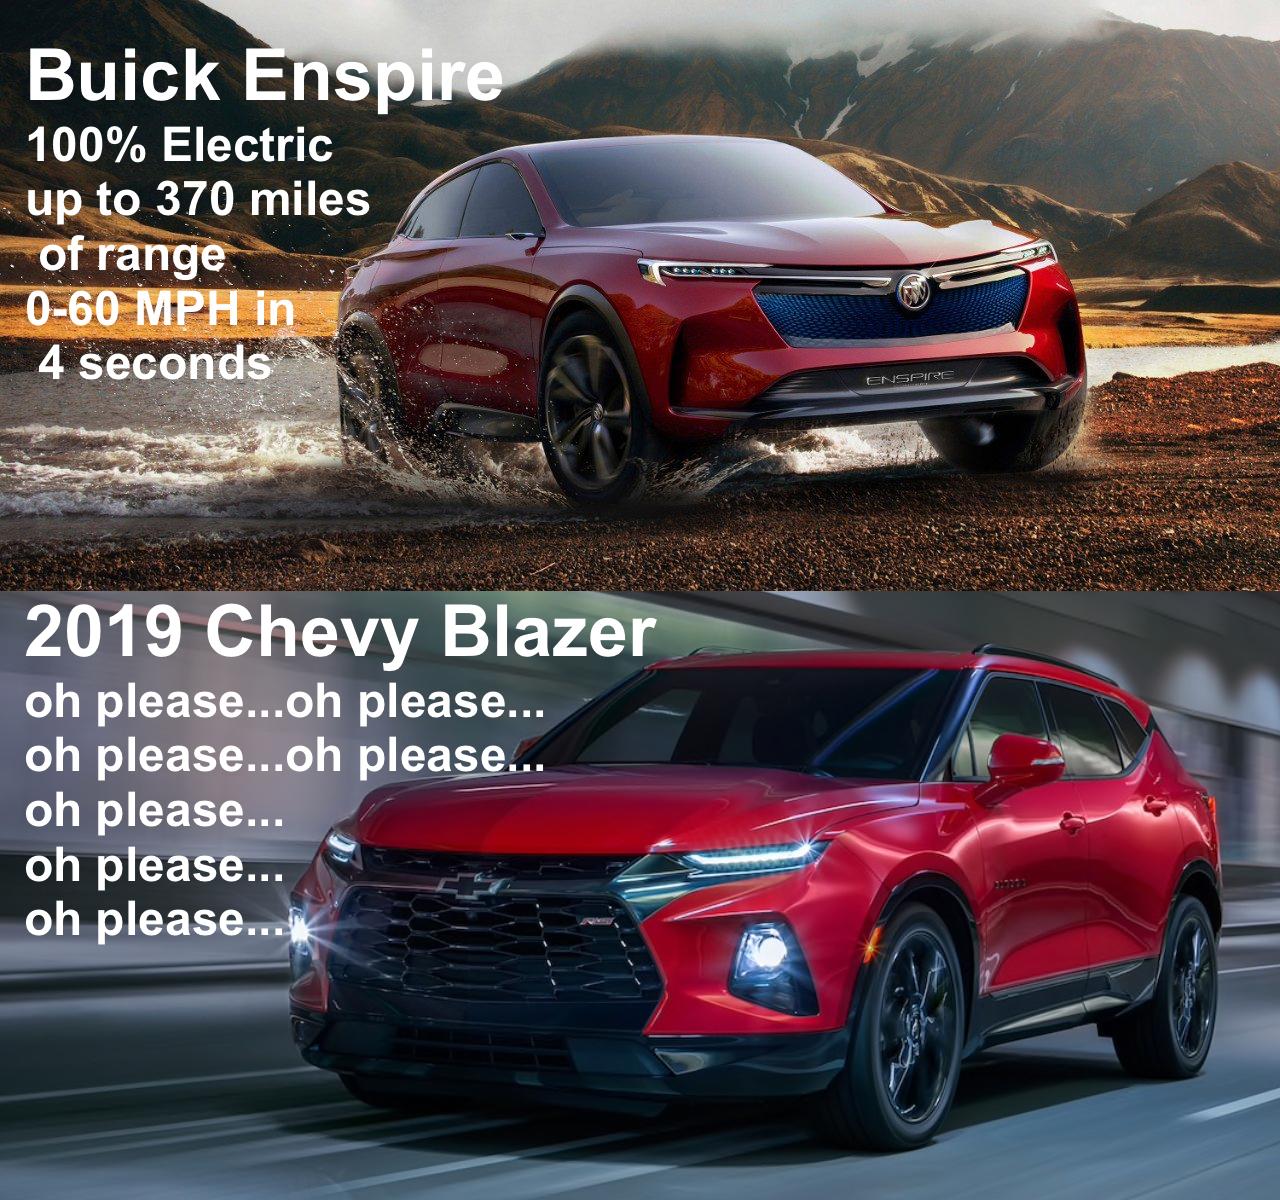 Buick Enspire Vs Chevy Blazer